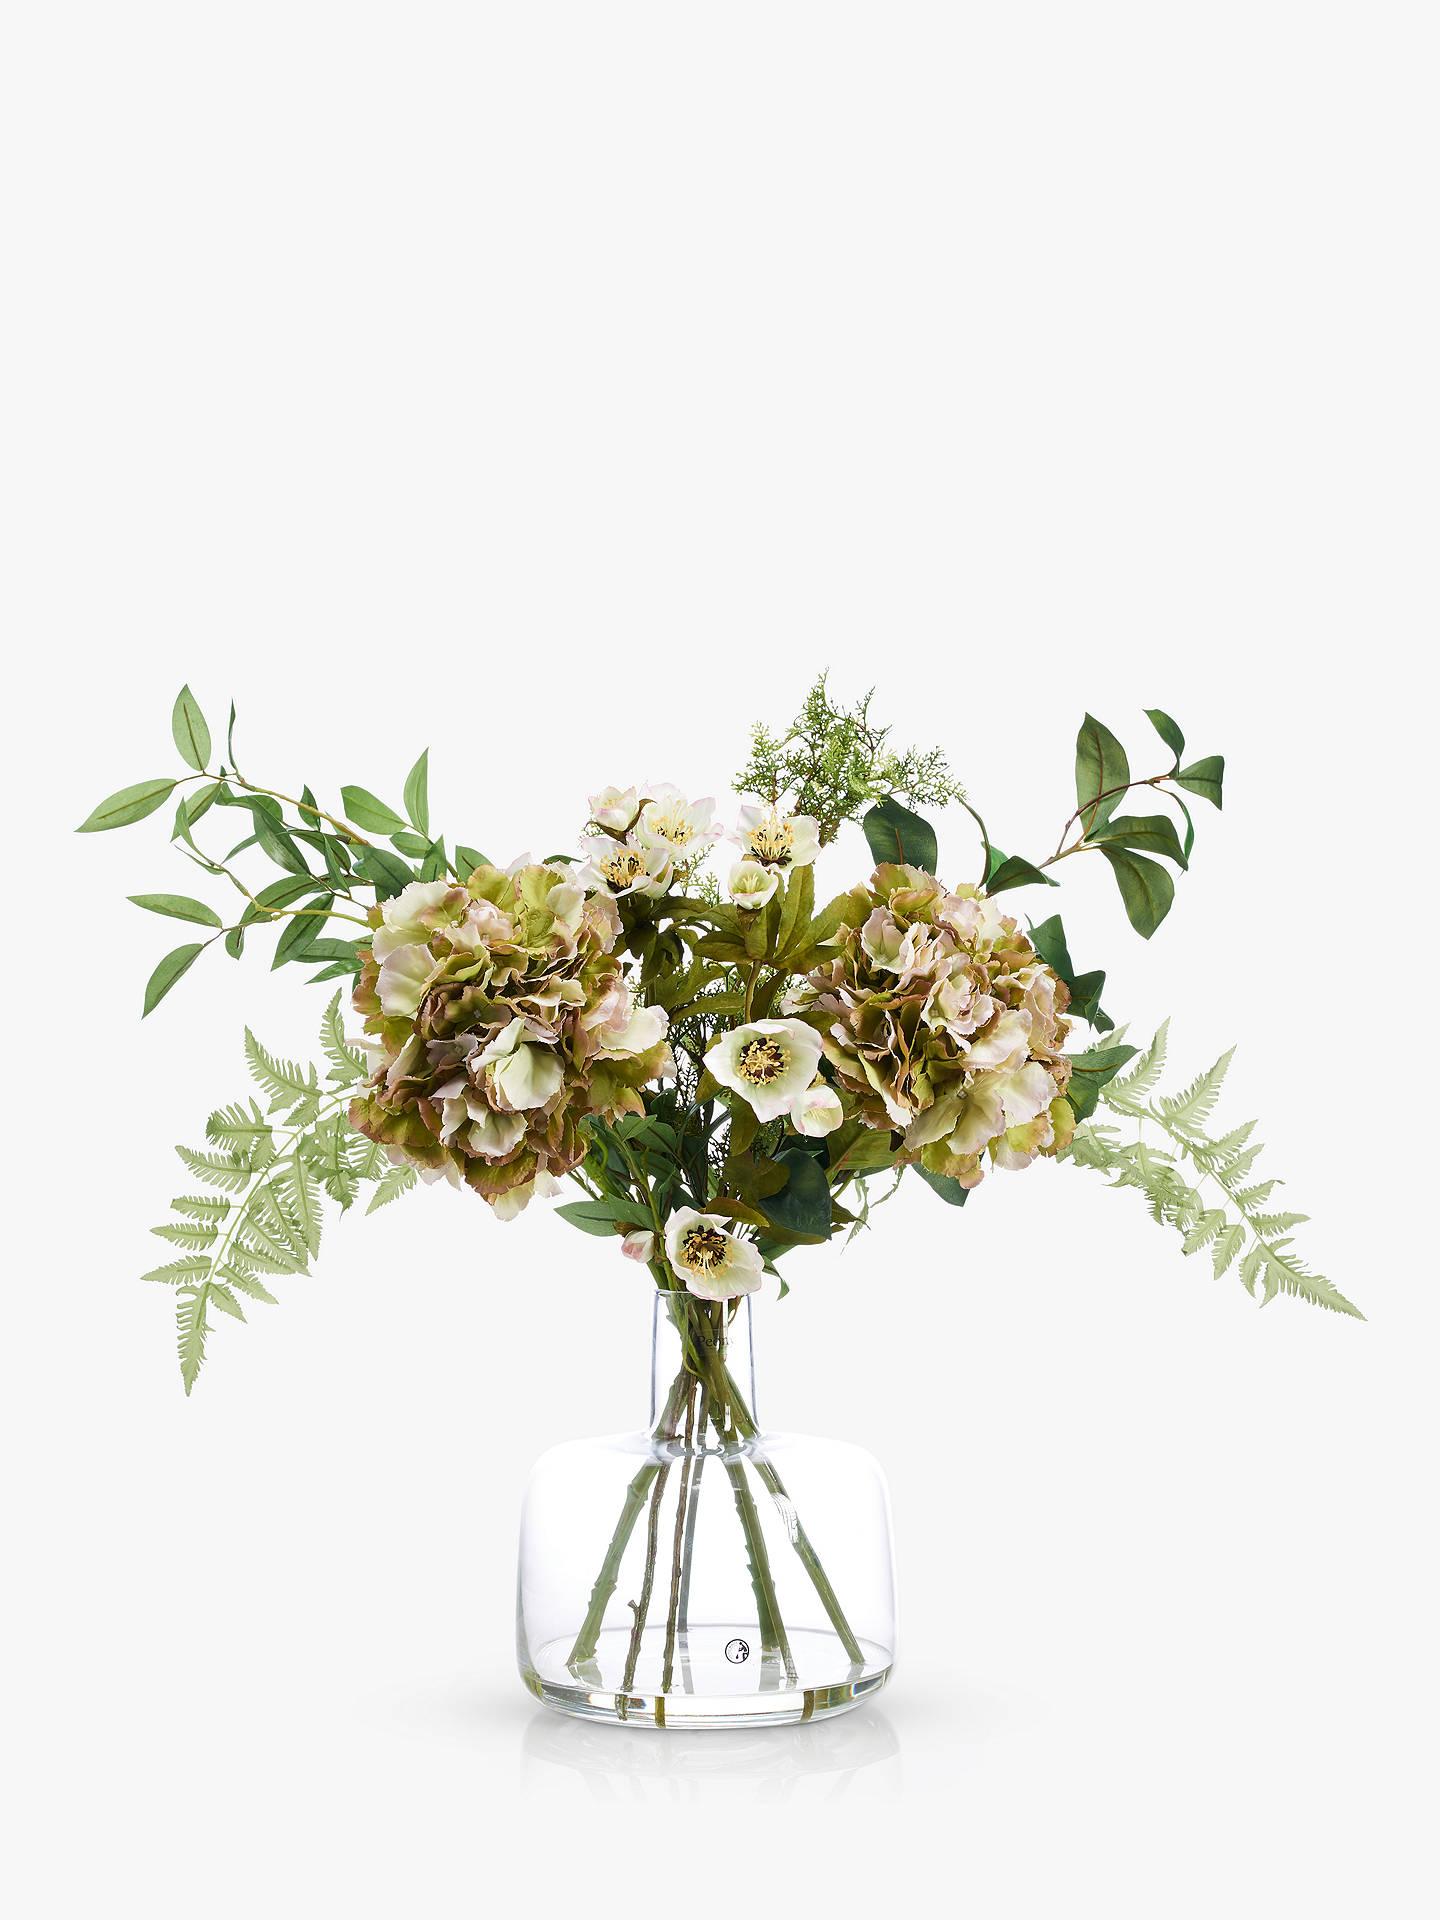 Peony Hydrangea Hellebore Artificial Flowers In Vase At John Lewis Partners